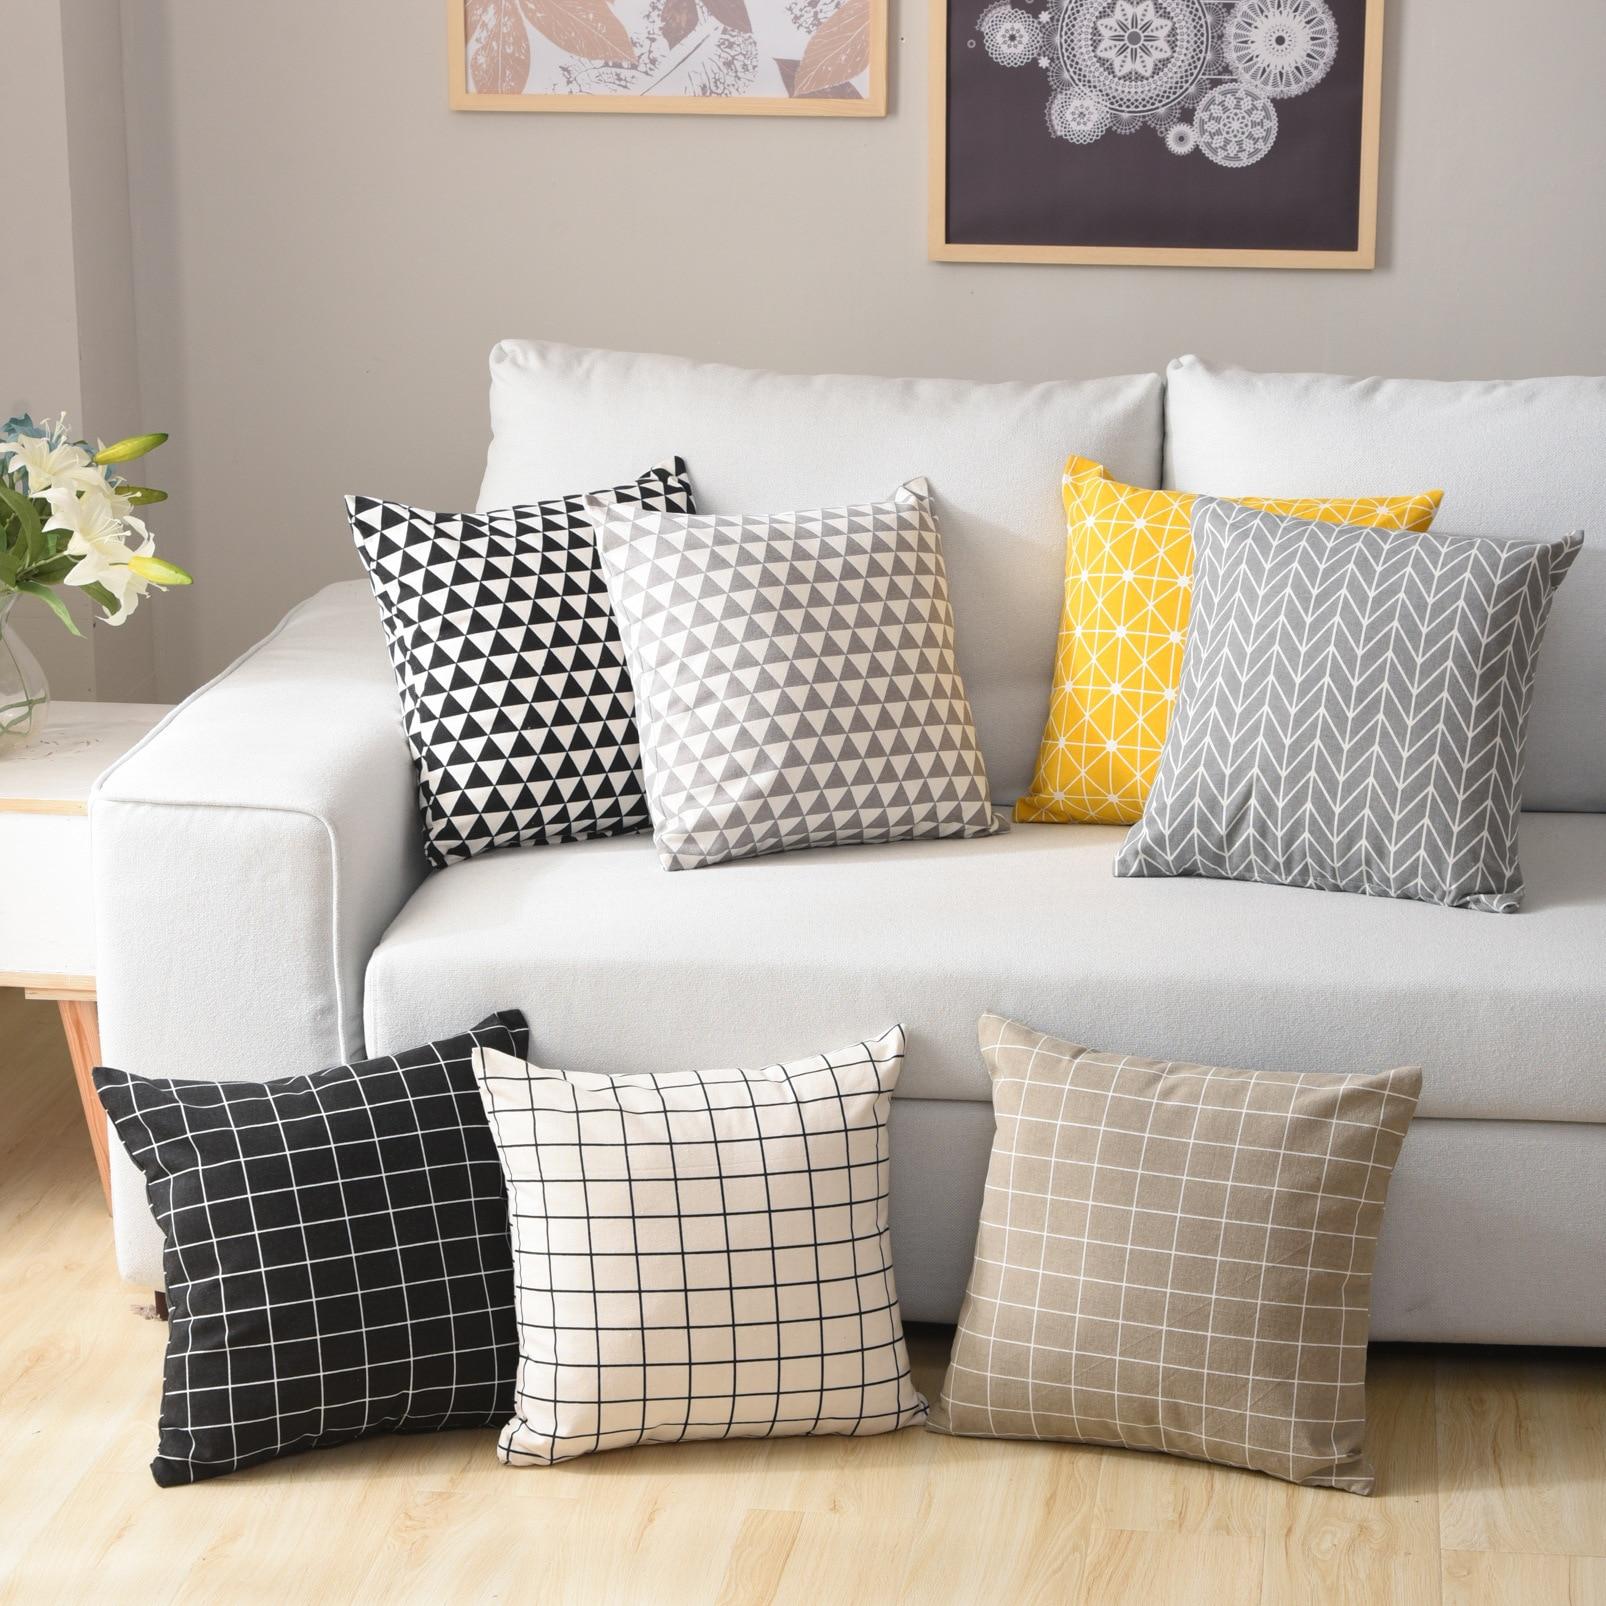 45x45cm Northern European Style Cotton Linen Couch Pillow Cushion Lumbar Support Pillow Hold Pillow Case Bedding